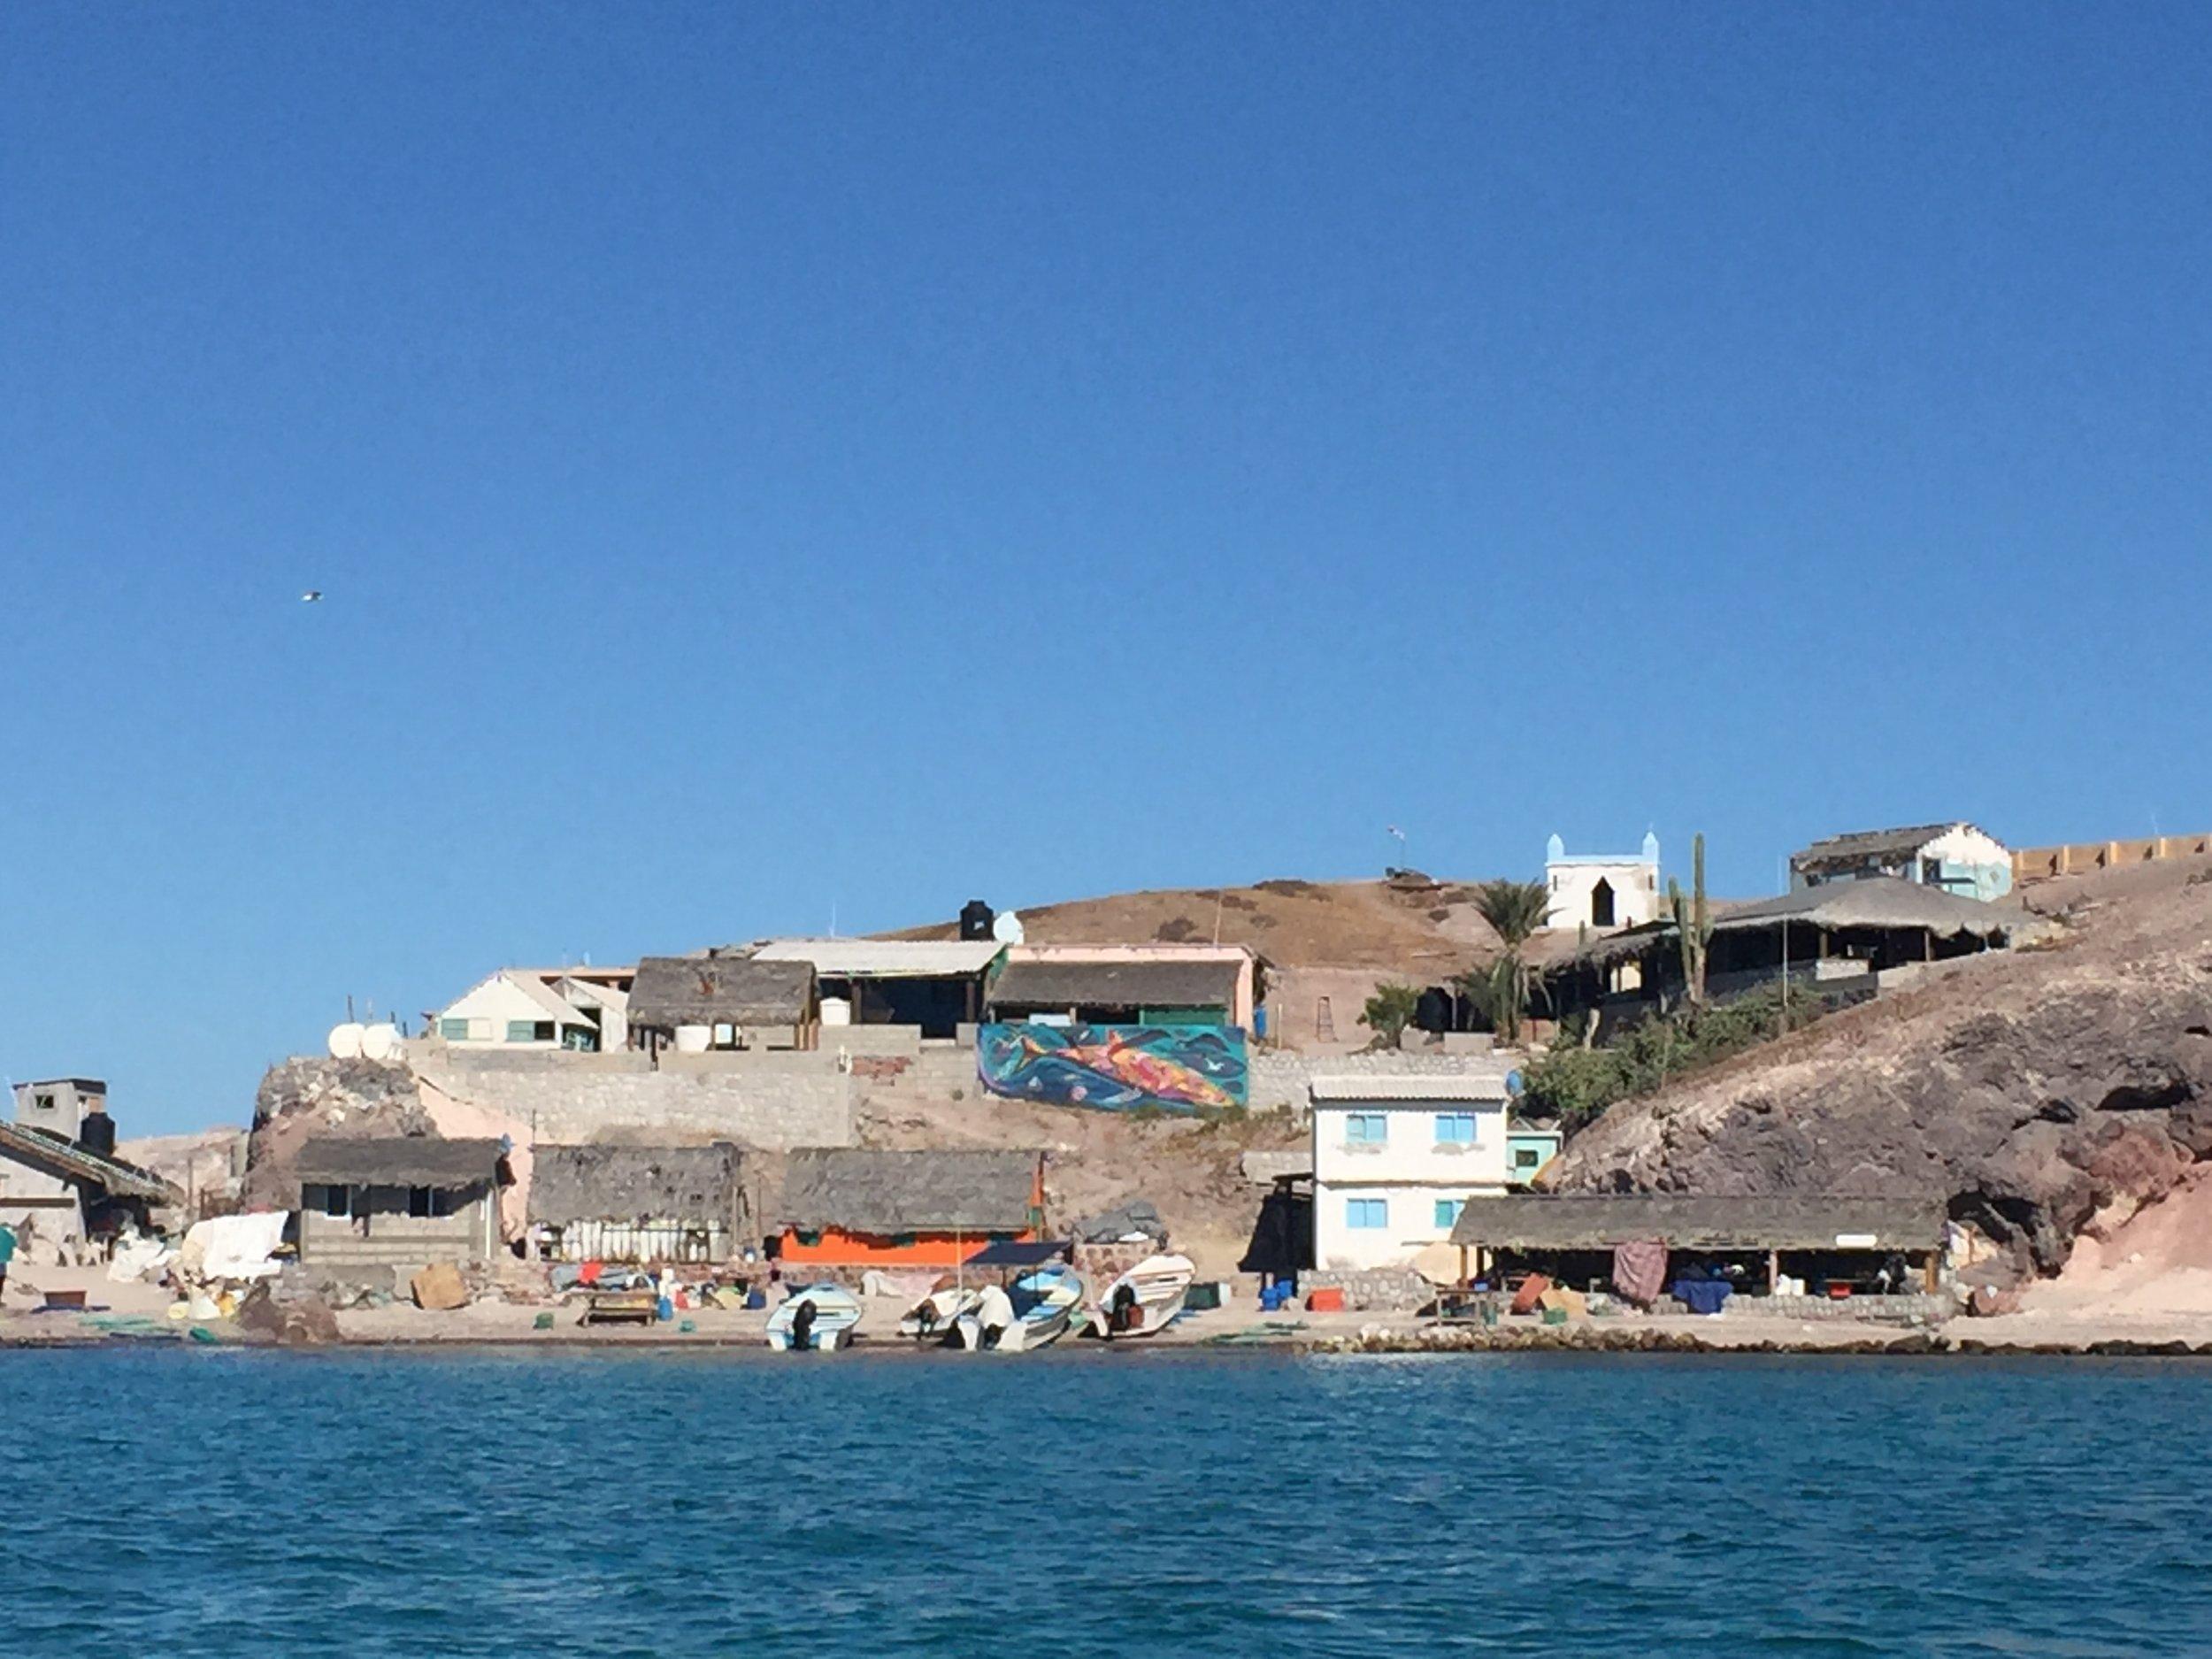 The fishing village on Isla Coyote